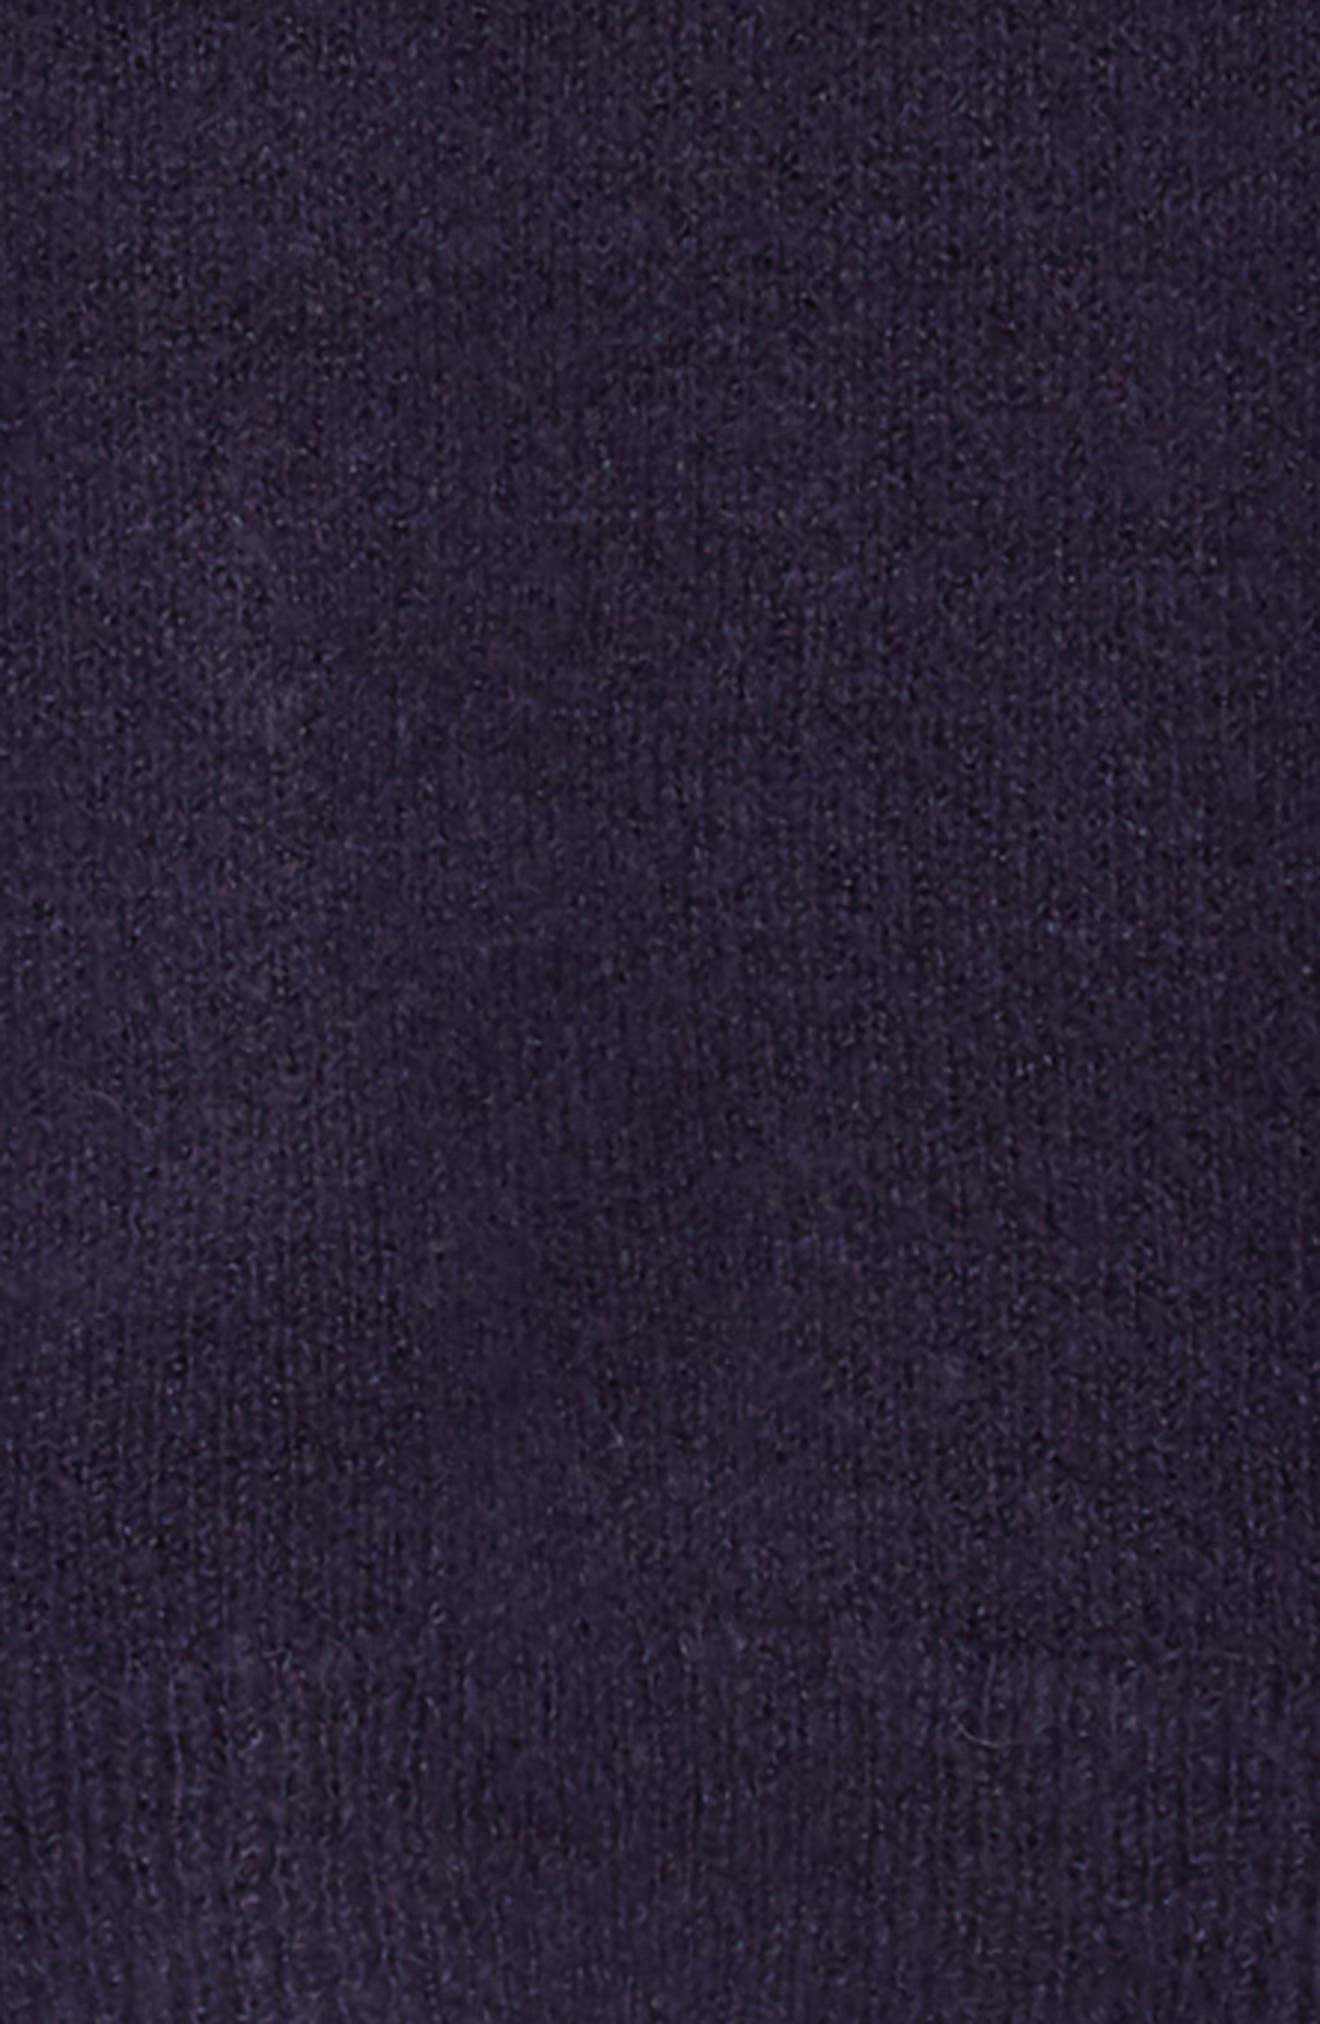 Bubble Sleeve Sweater,                             Alternate thumbnail 2, color,                             NAVY PEACOAT